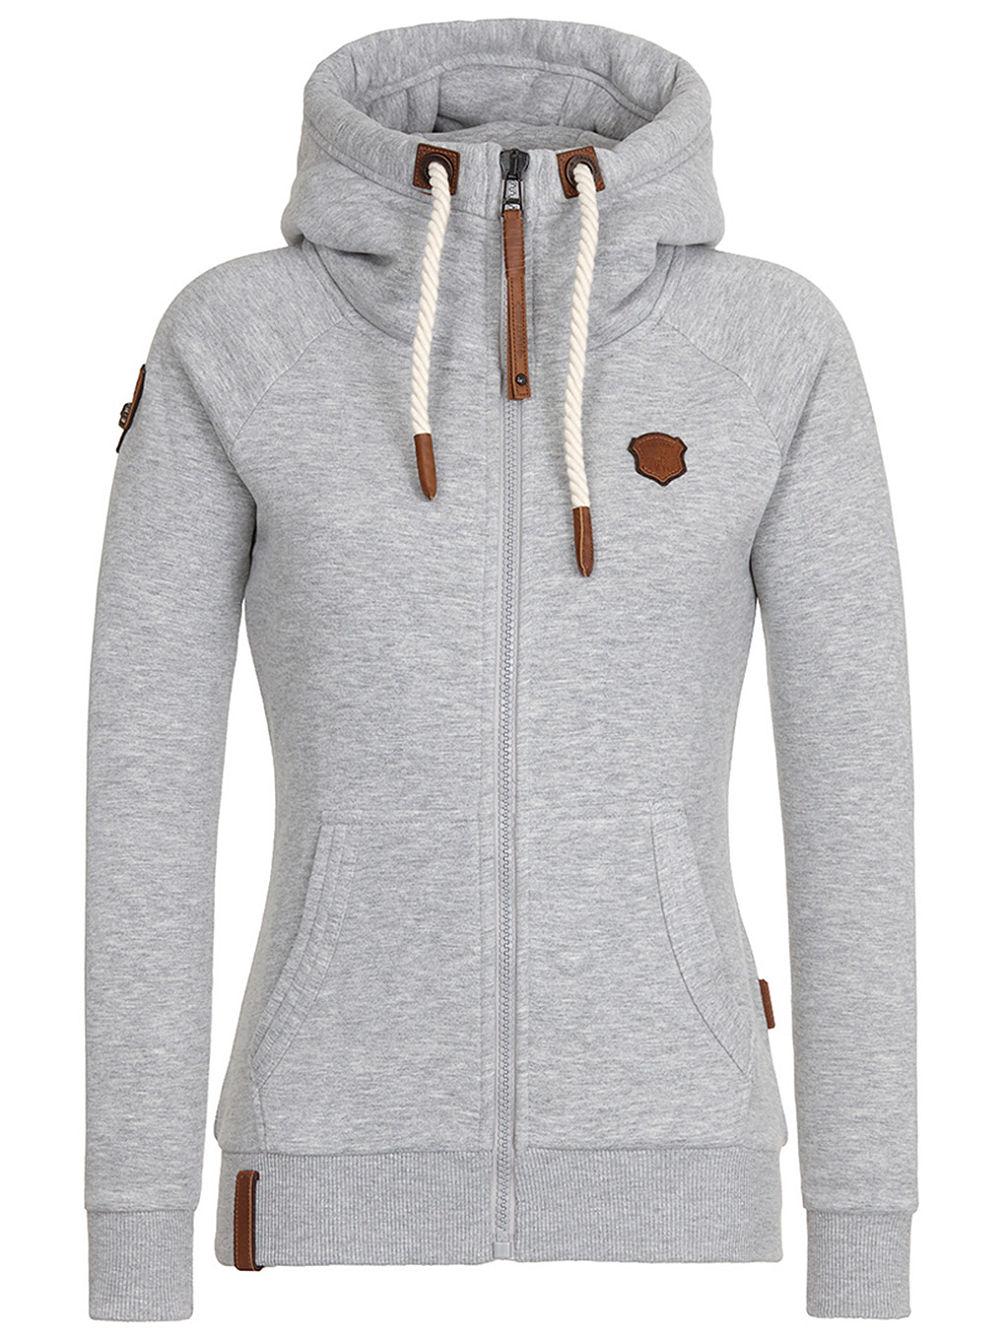 buy naketano brazzo vii zip hoodie online at blue. Black Bedroom Furniture Sets. Home Design Ideas